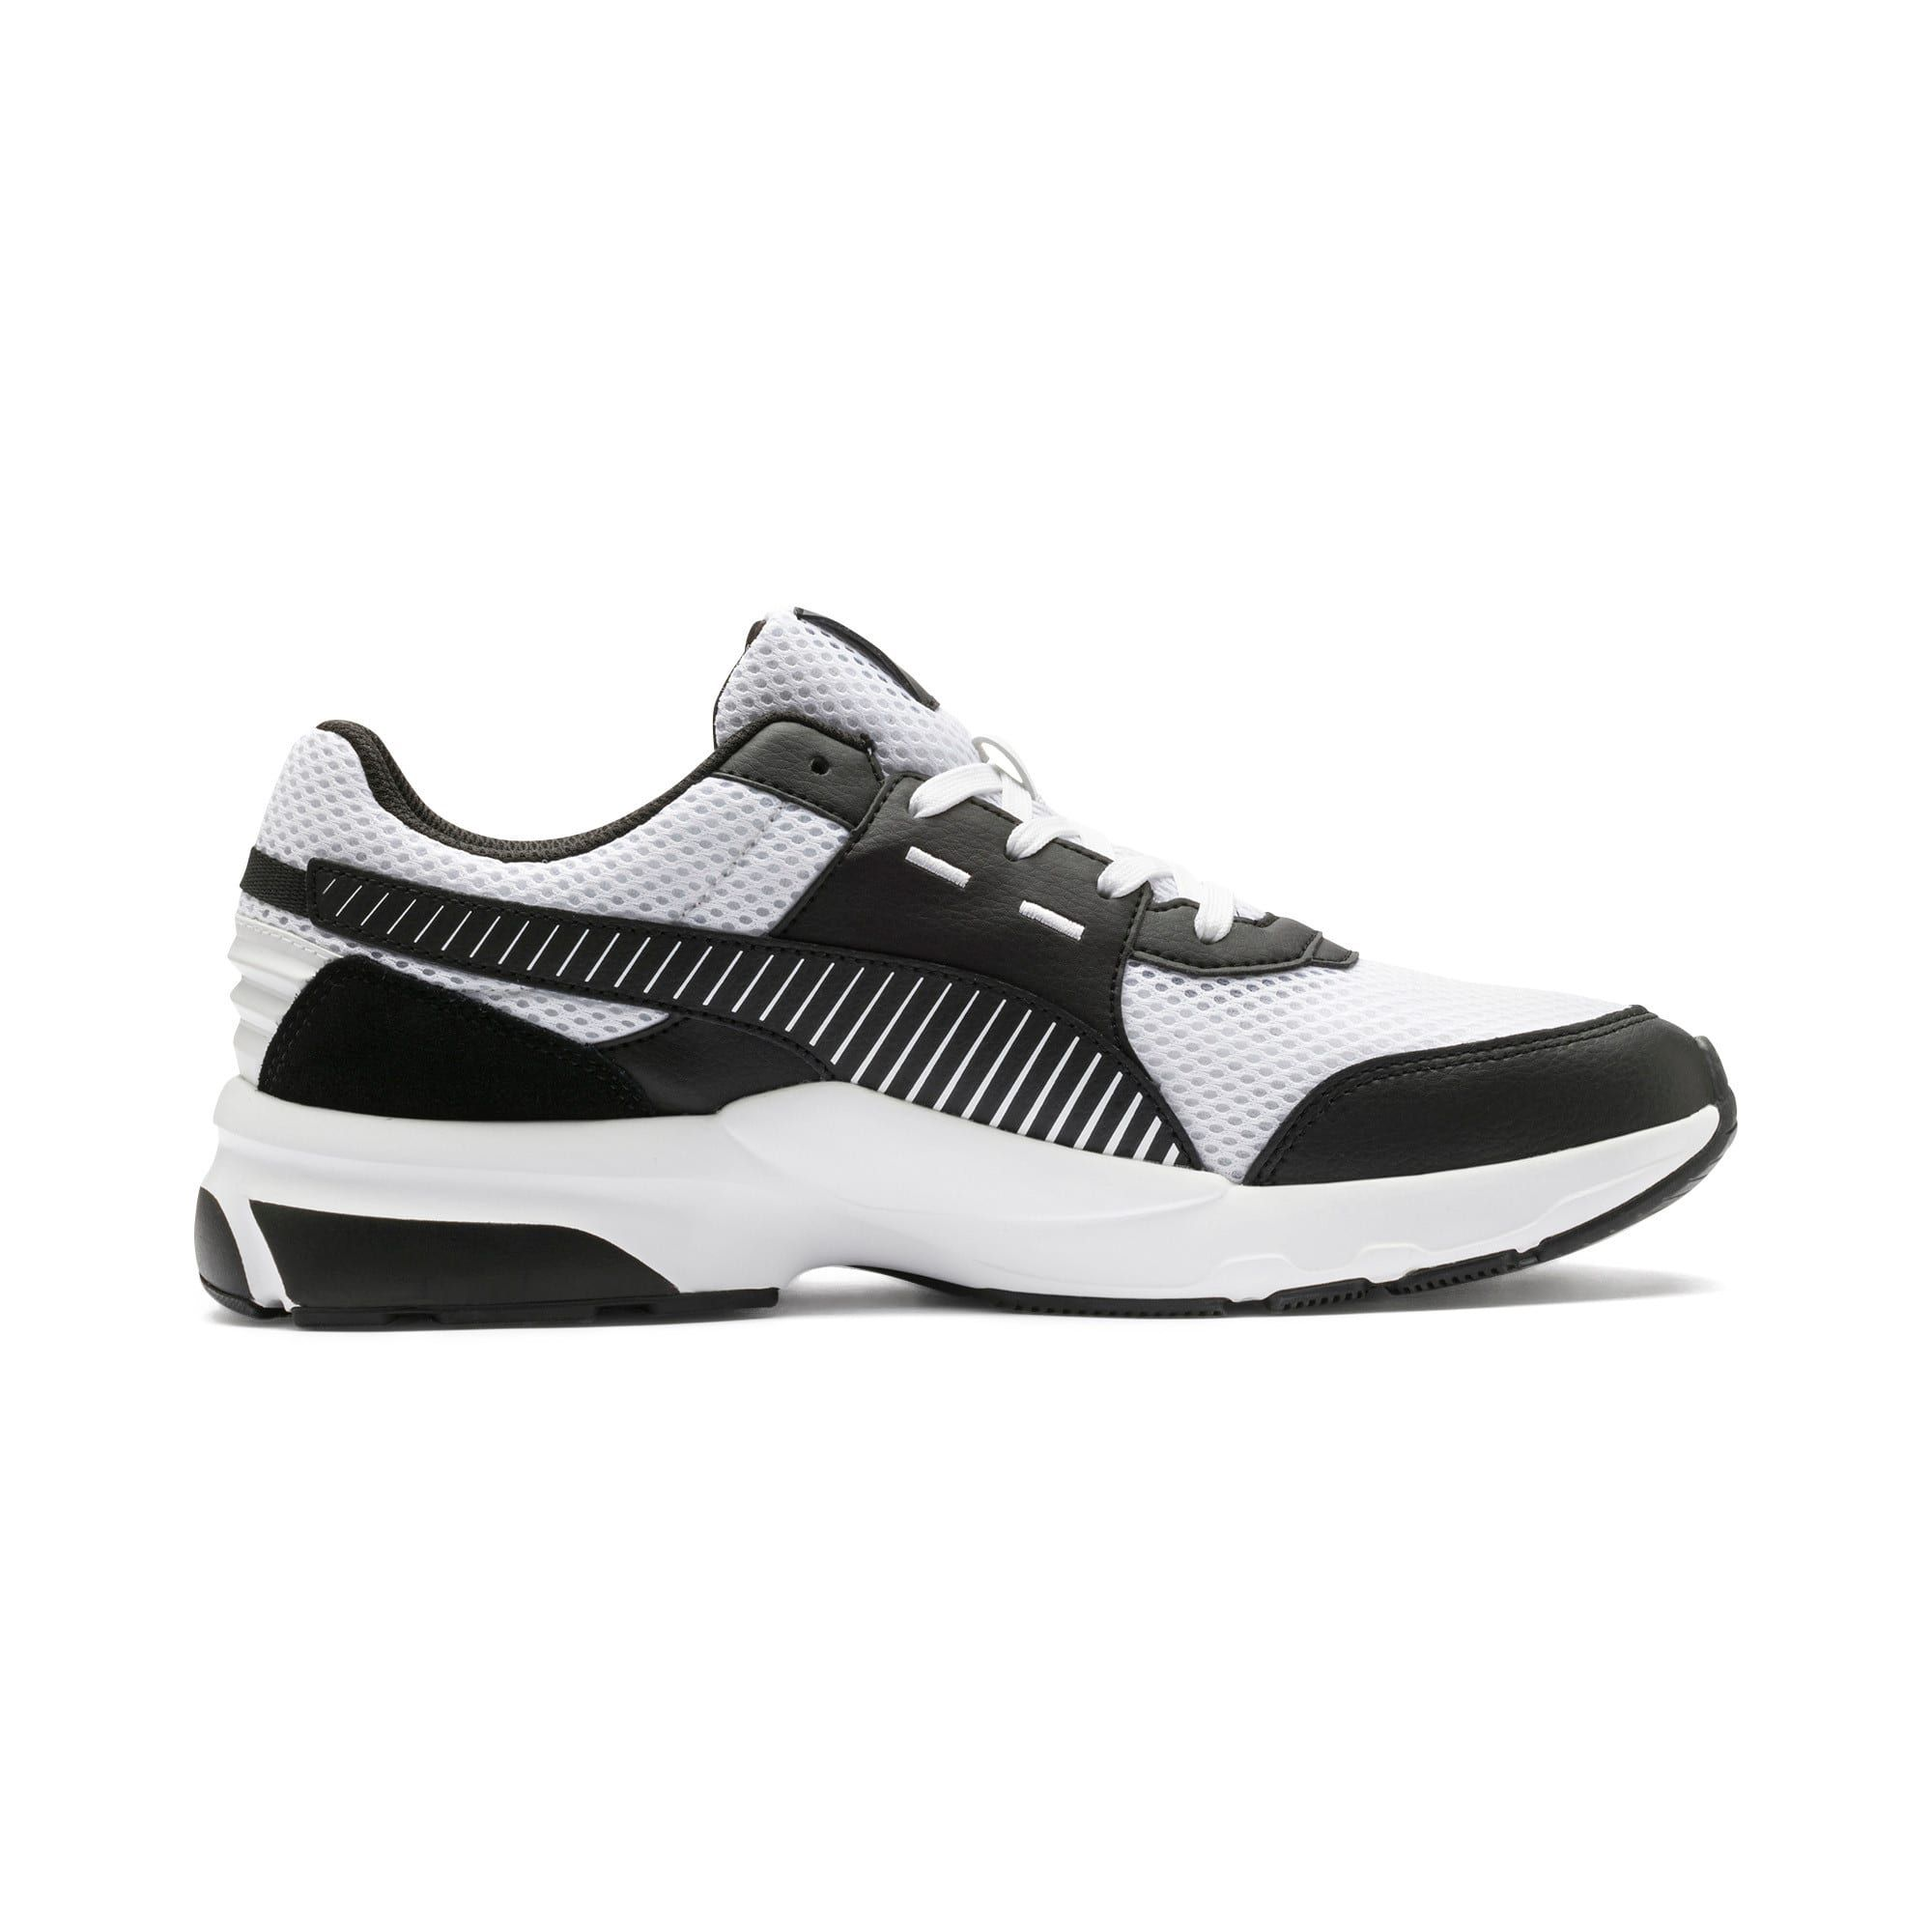 PUMA Chaussure de course Future Runner Premium, BlancNoir